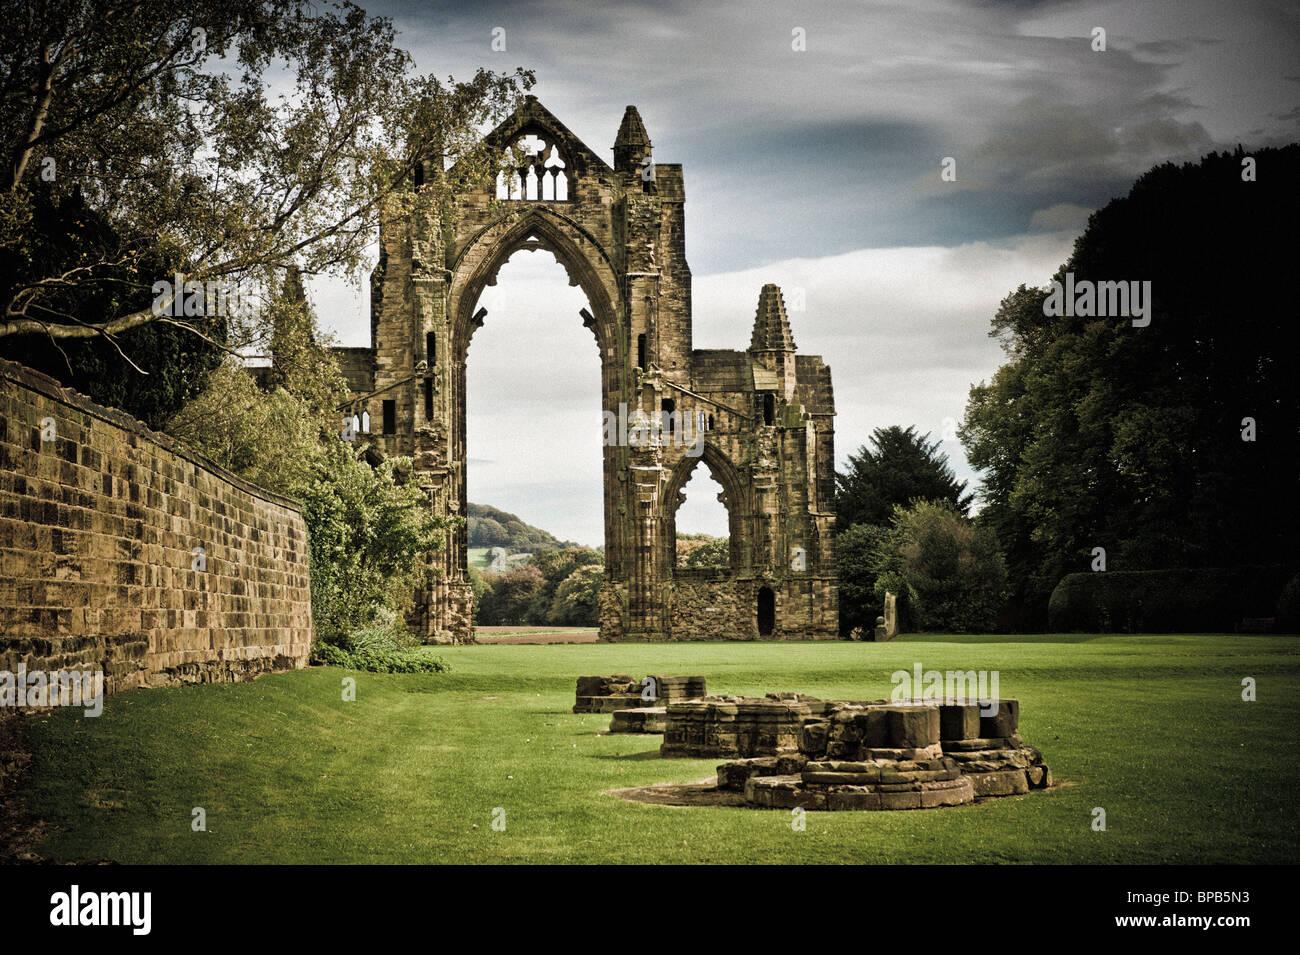 Guisborough Priory - Stock Image